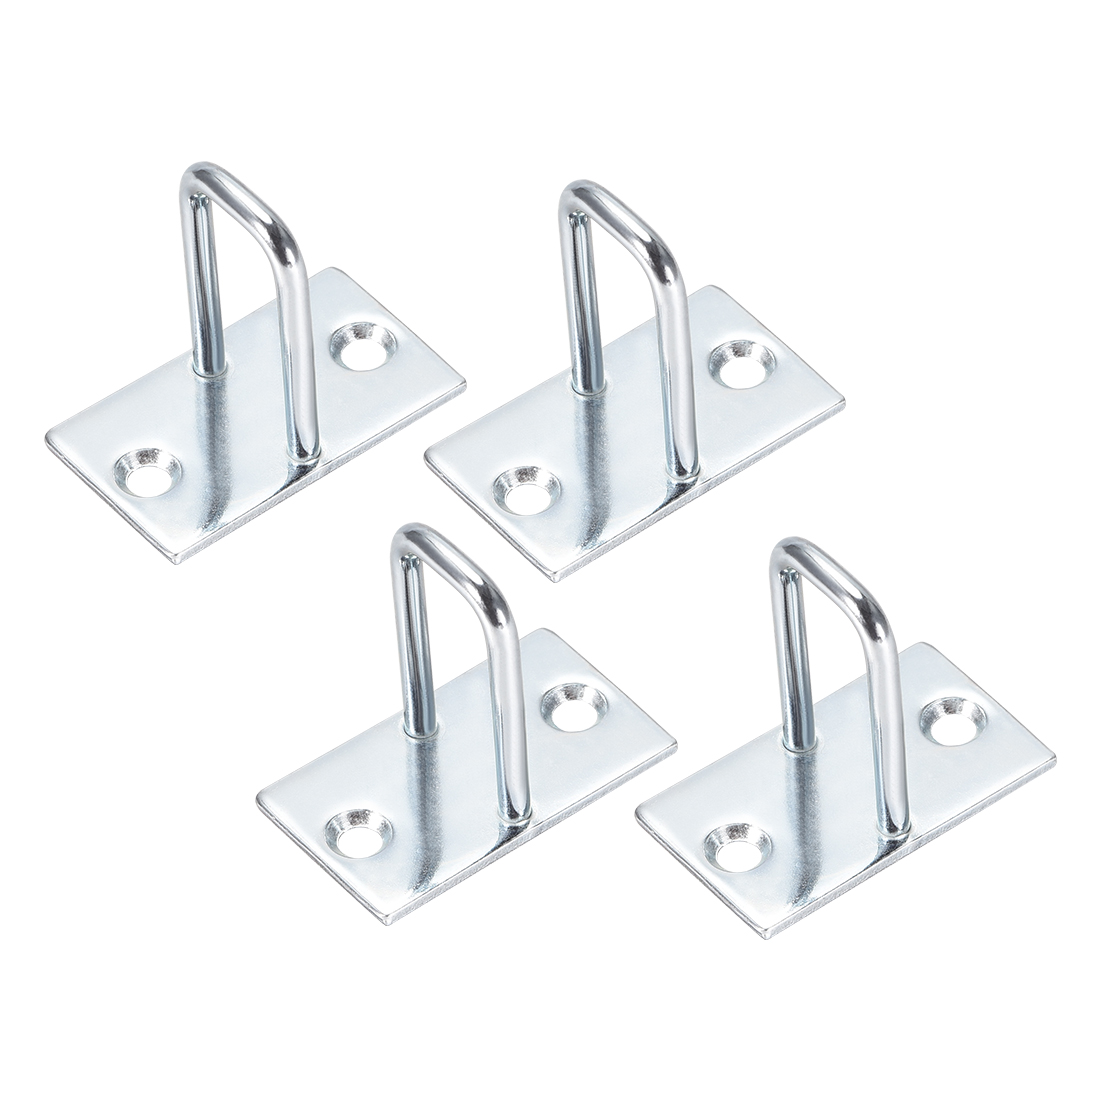 4pcs Electromagnetic Solenoid Lock Catch Latch Magnetic Lock Parts 34.5x20x29mm